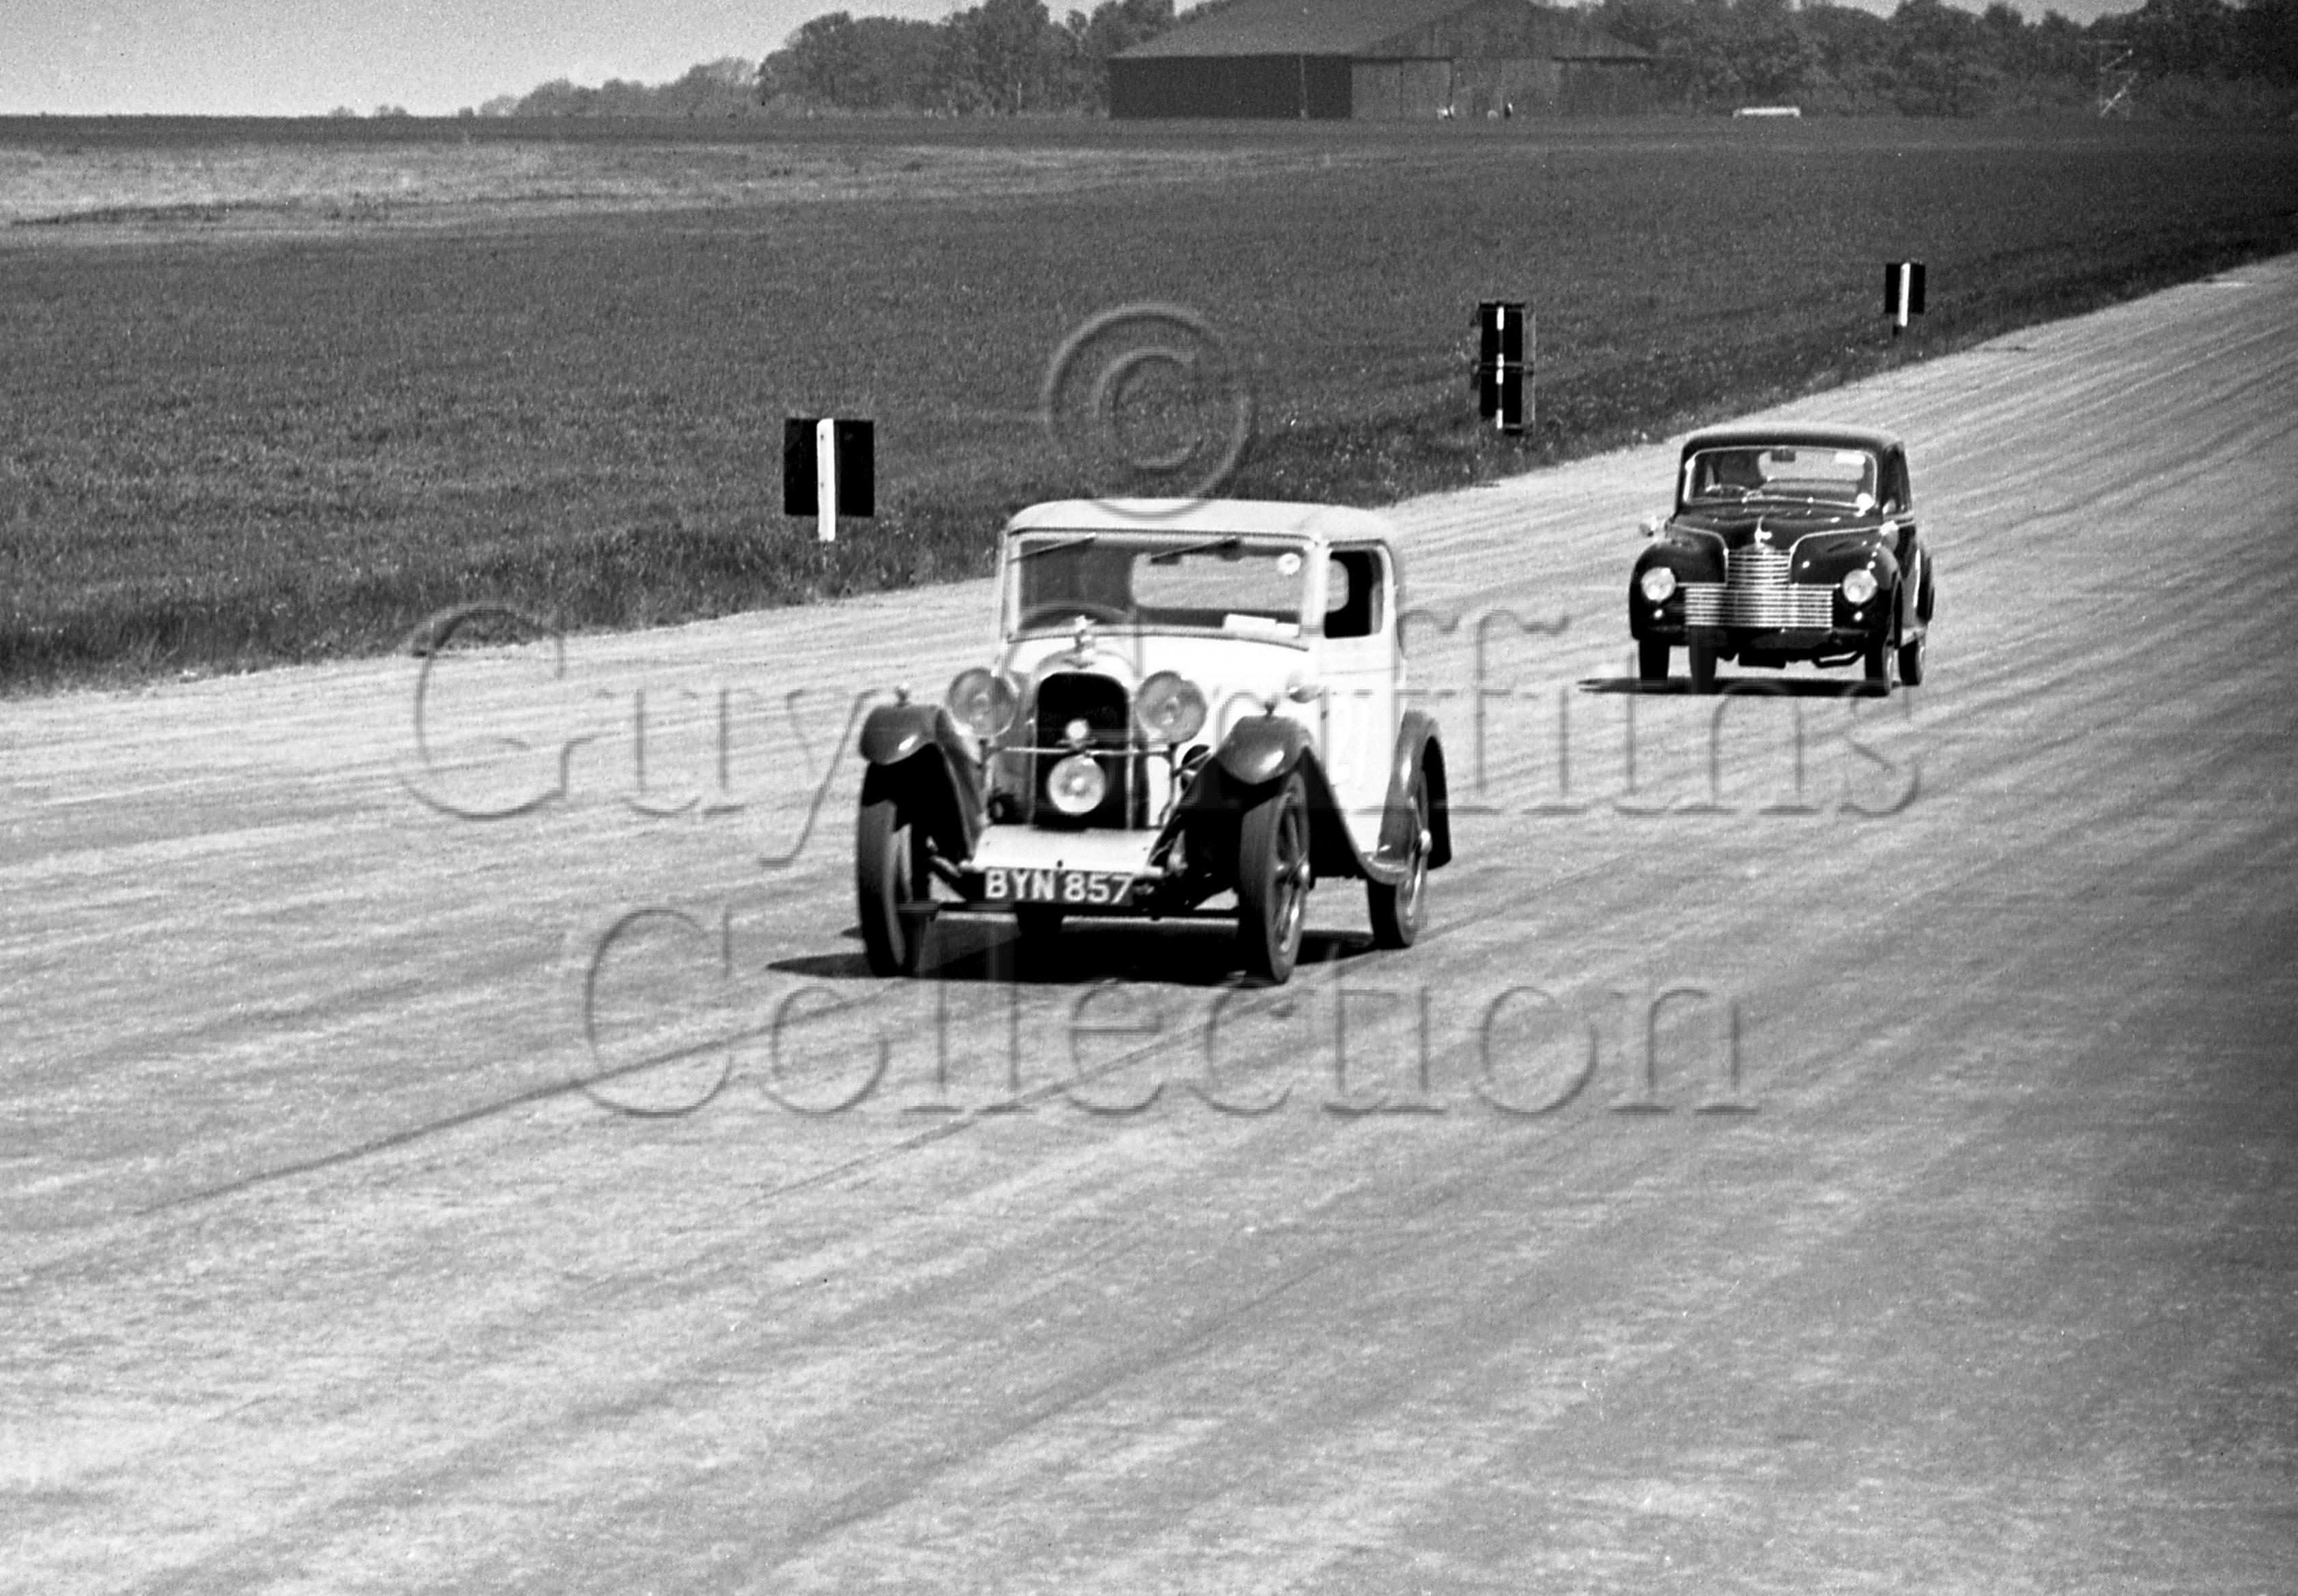 44-525–H-Dearden–Rapier–Silverstone–02-06-1951.jpg - The Guy Griffiths Collection